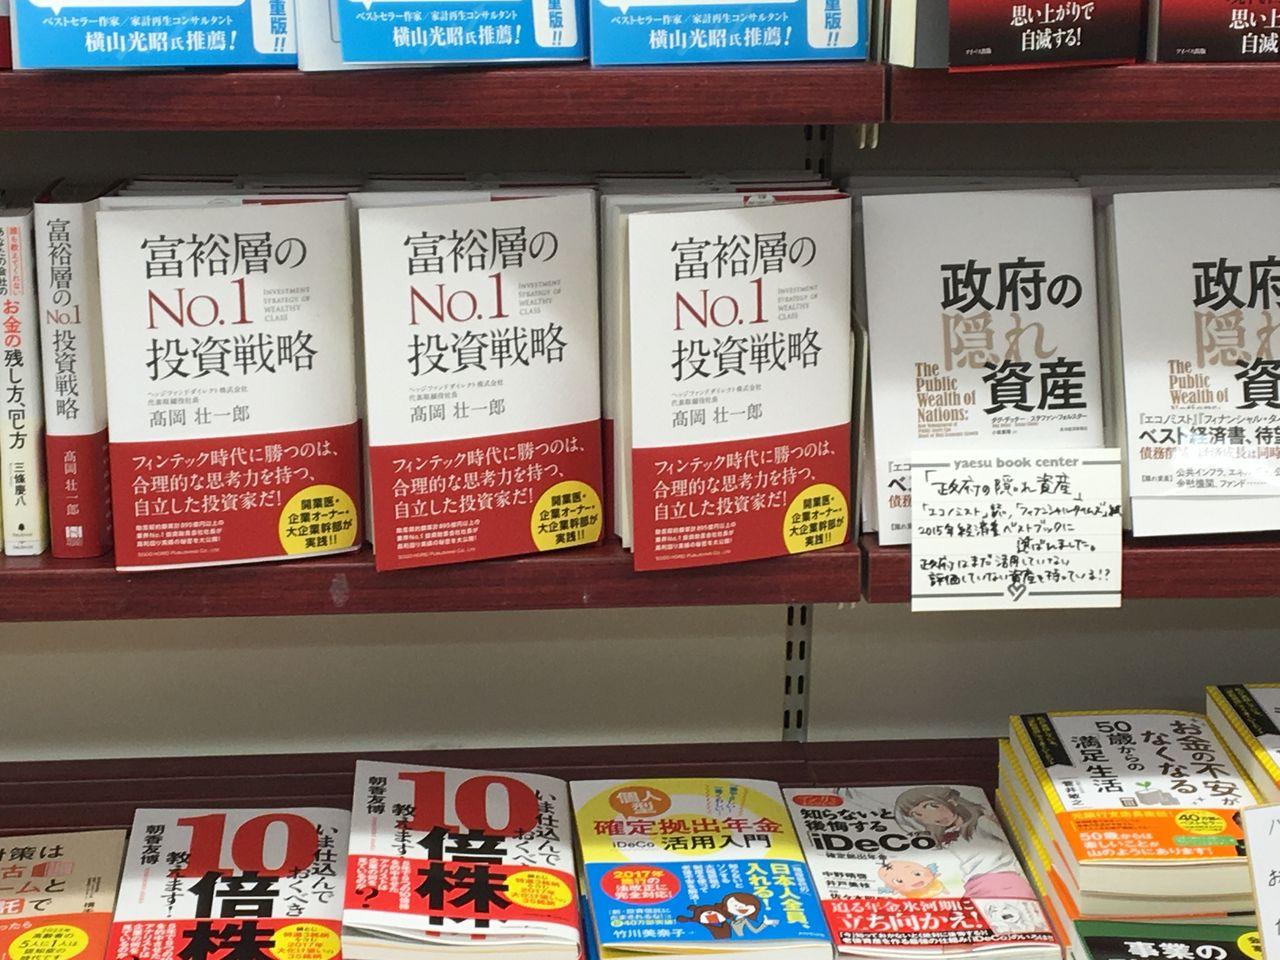 丸善での高岡壮一郎新刊展開